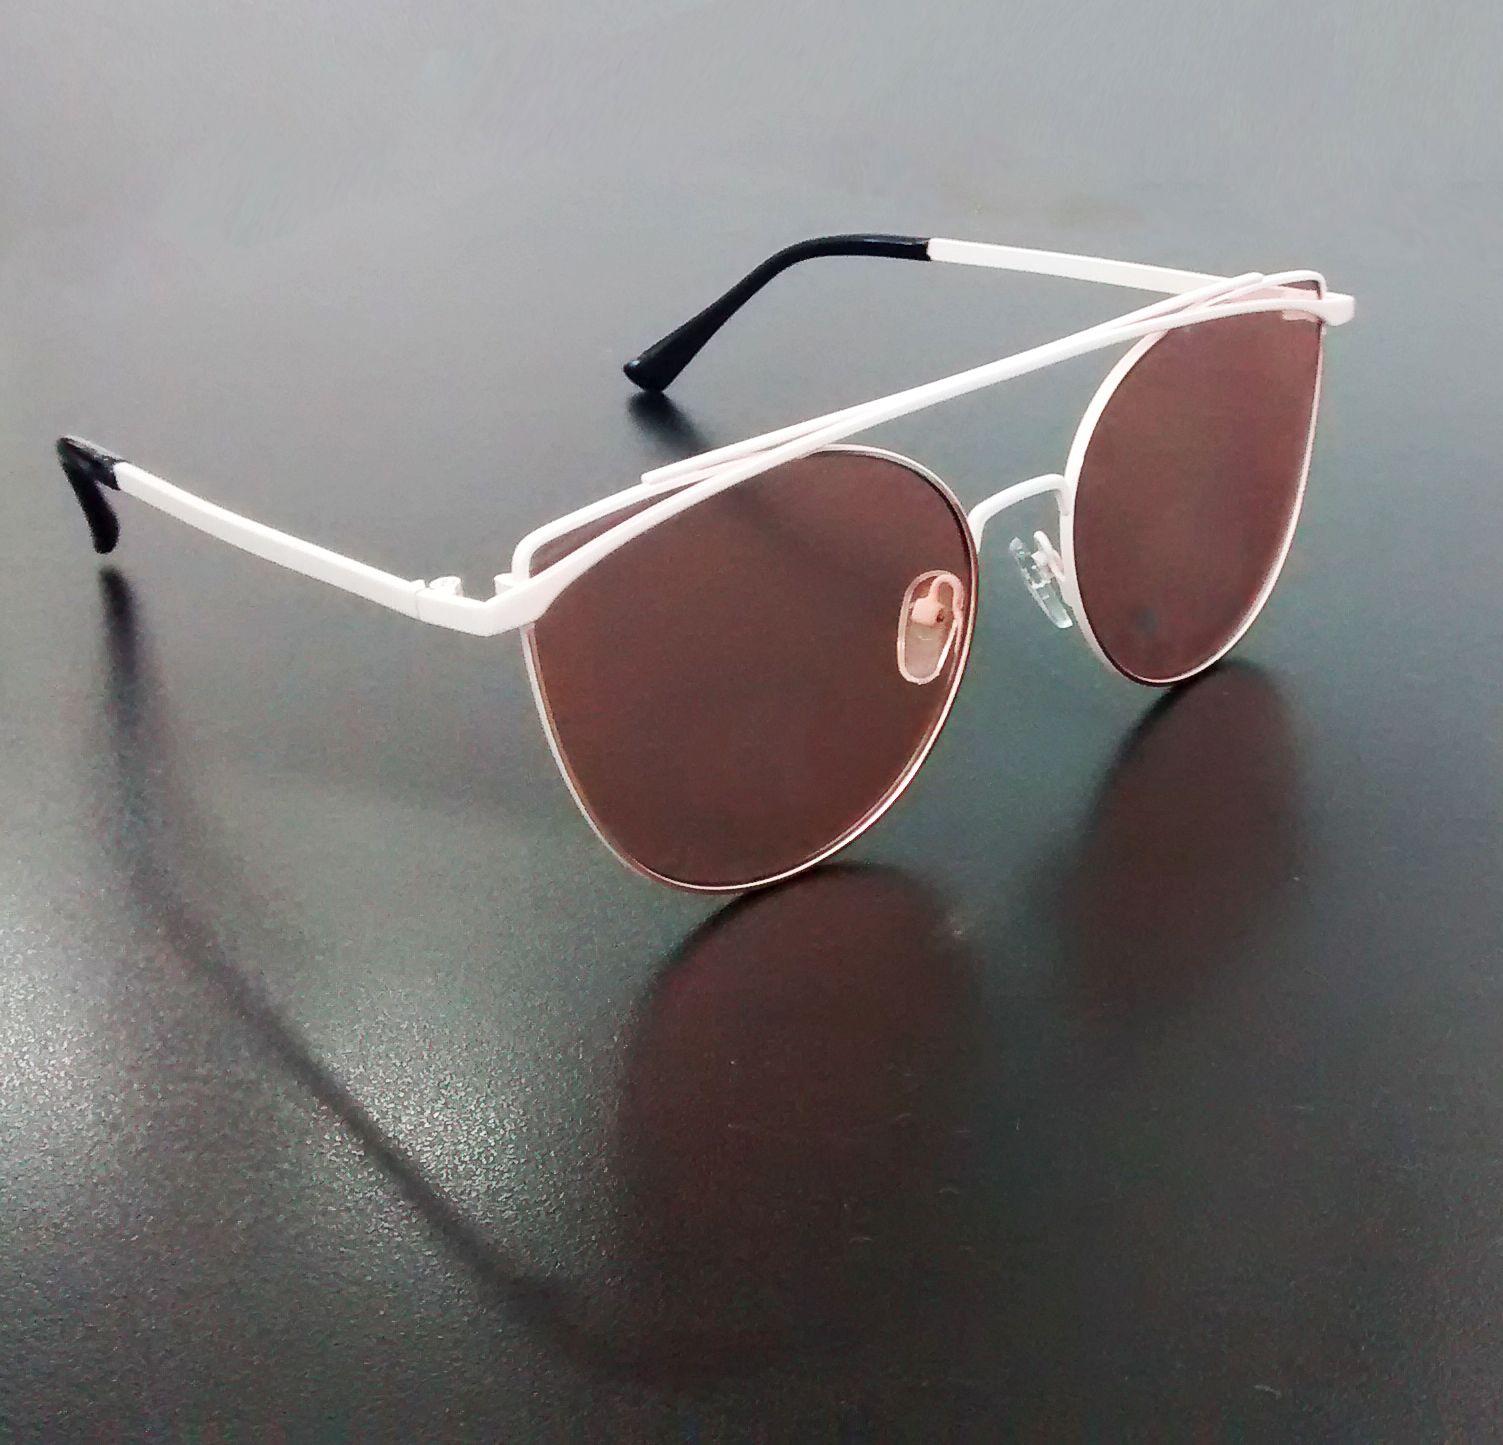 ad5516abee71e Óculos de sol Fonzaghi